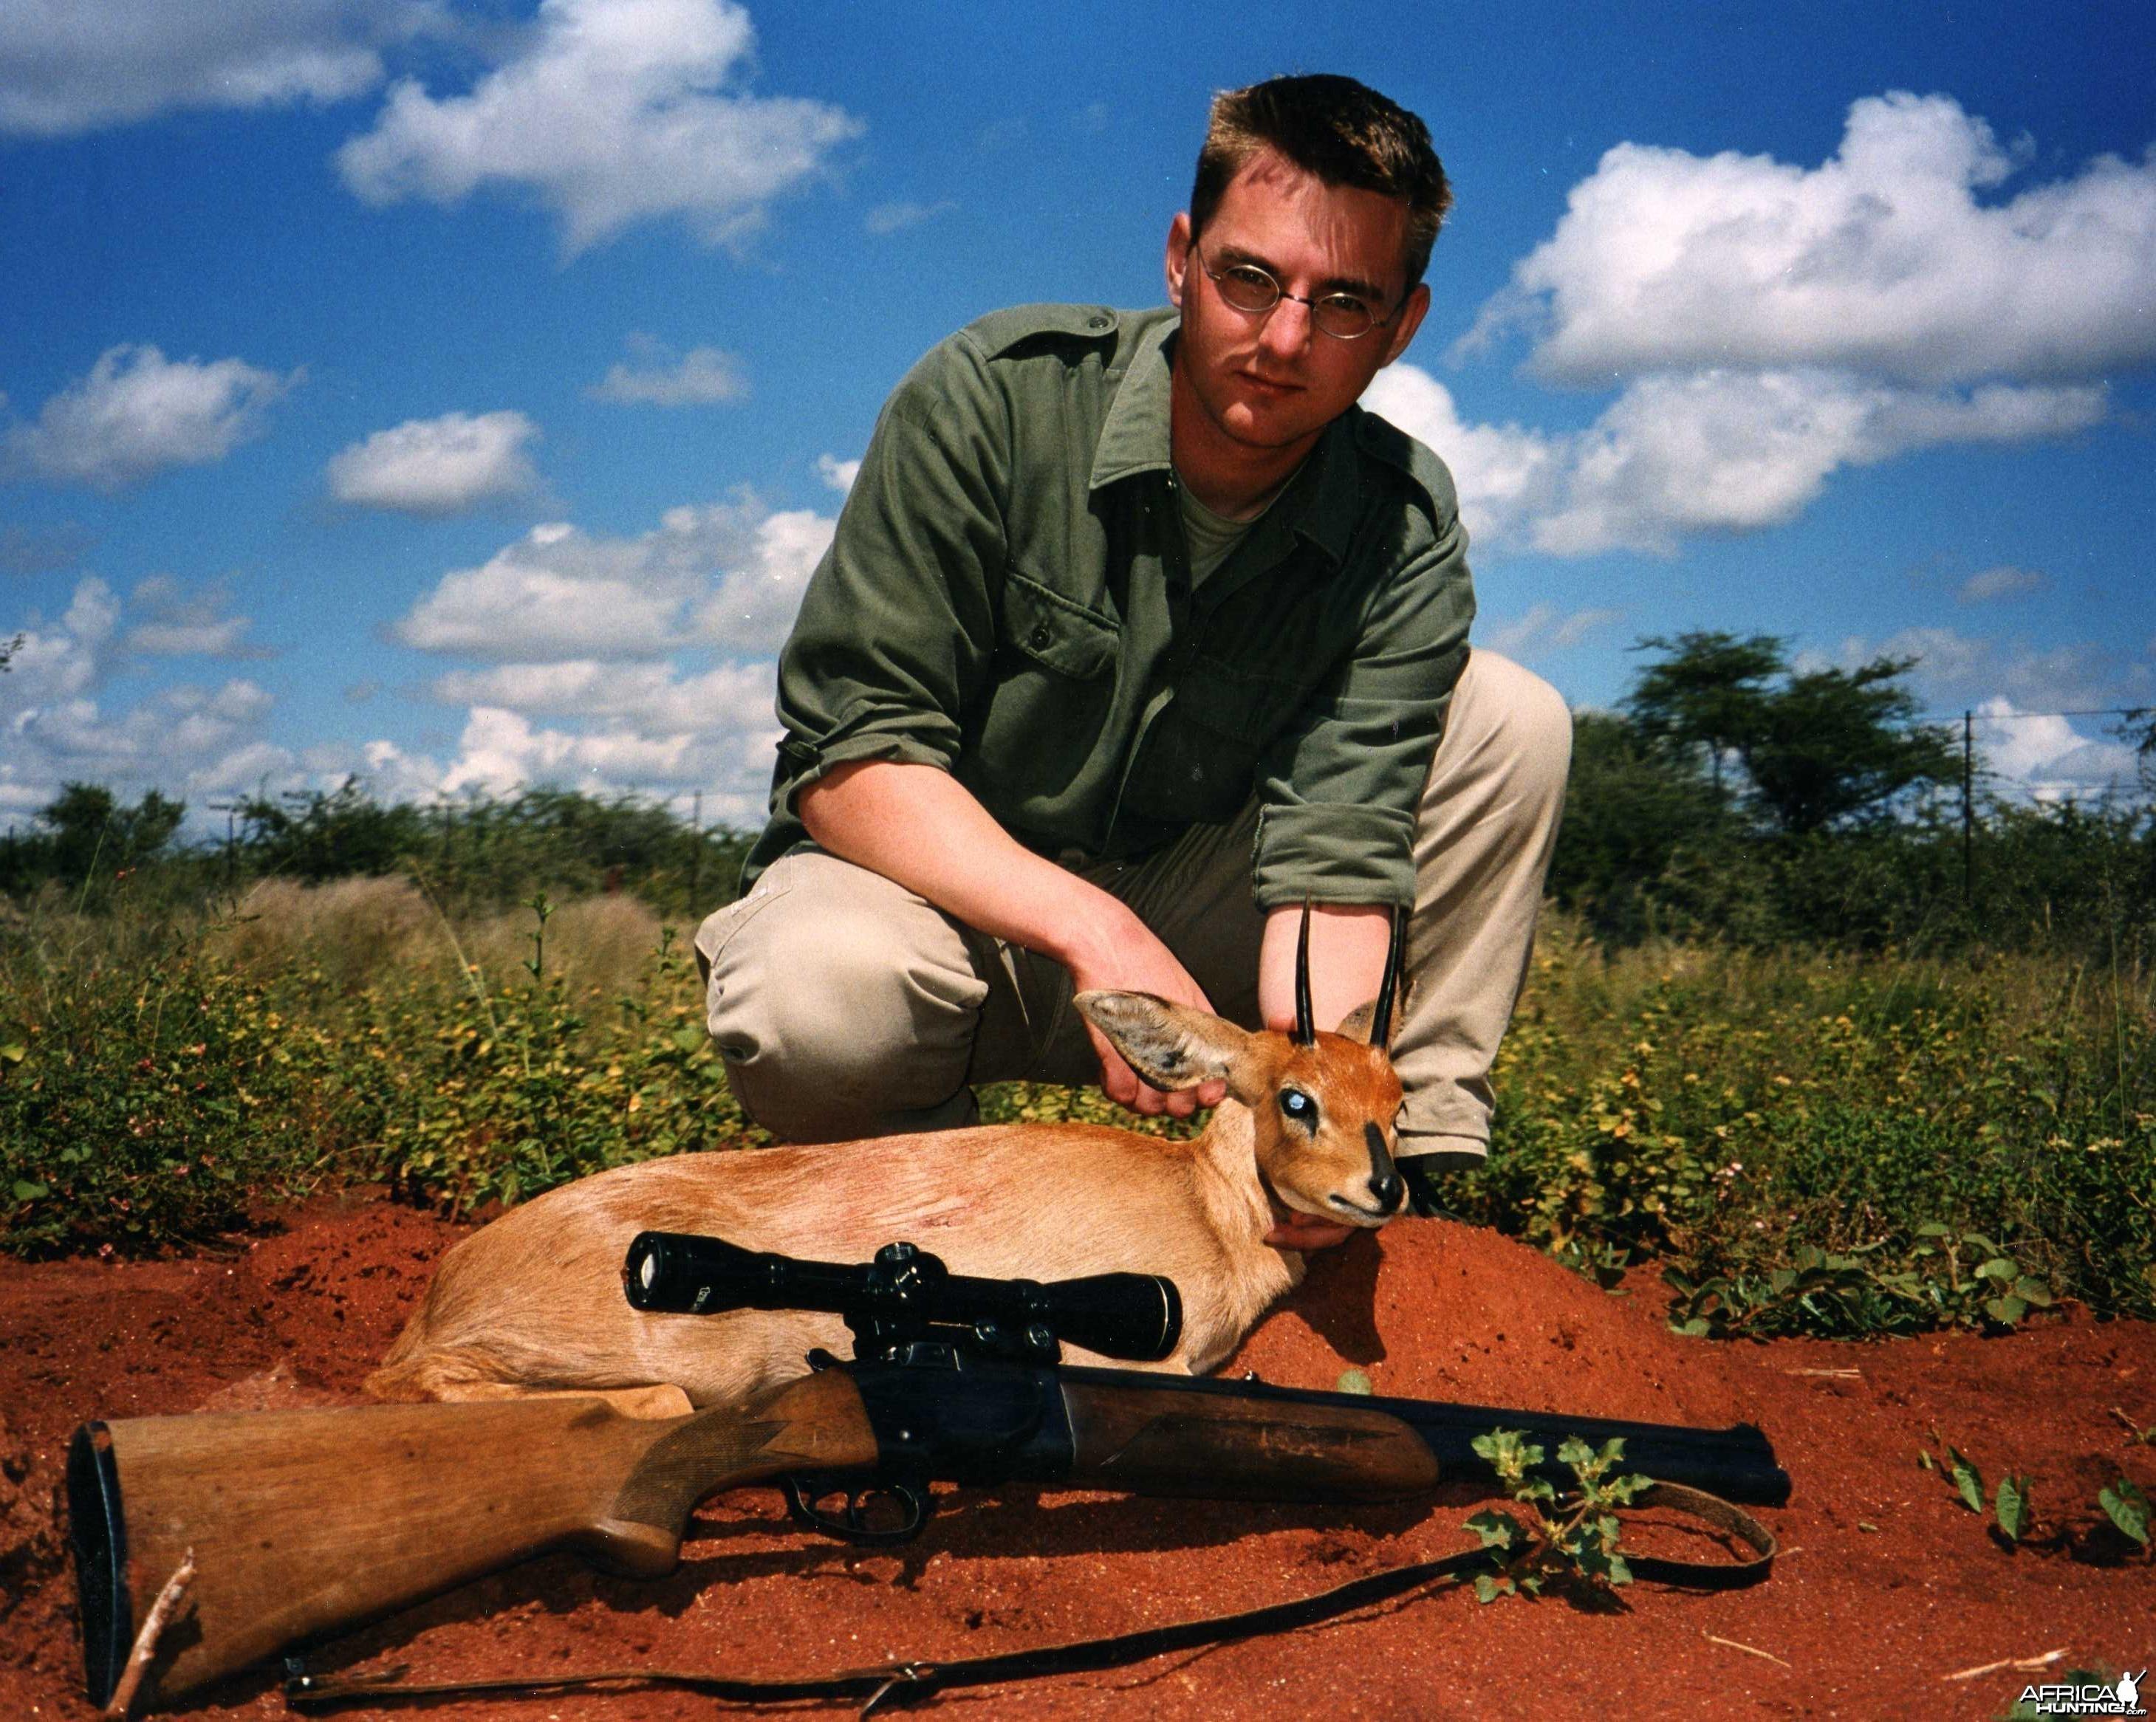 Steenbuck, Namibia 2002